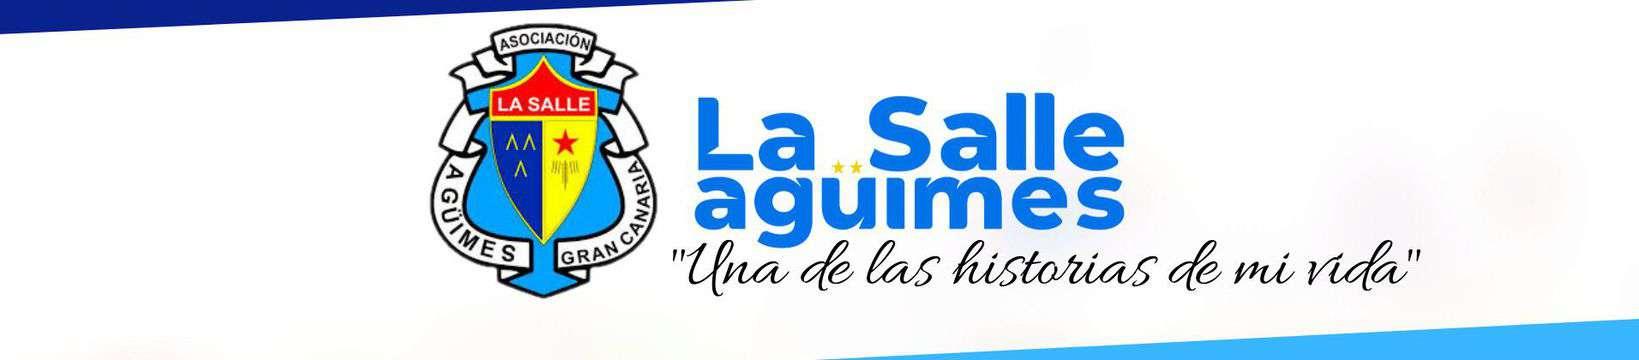 La Salle Agüimes cabecera